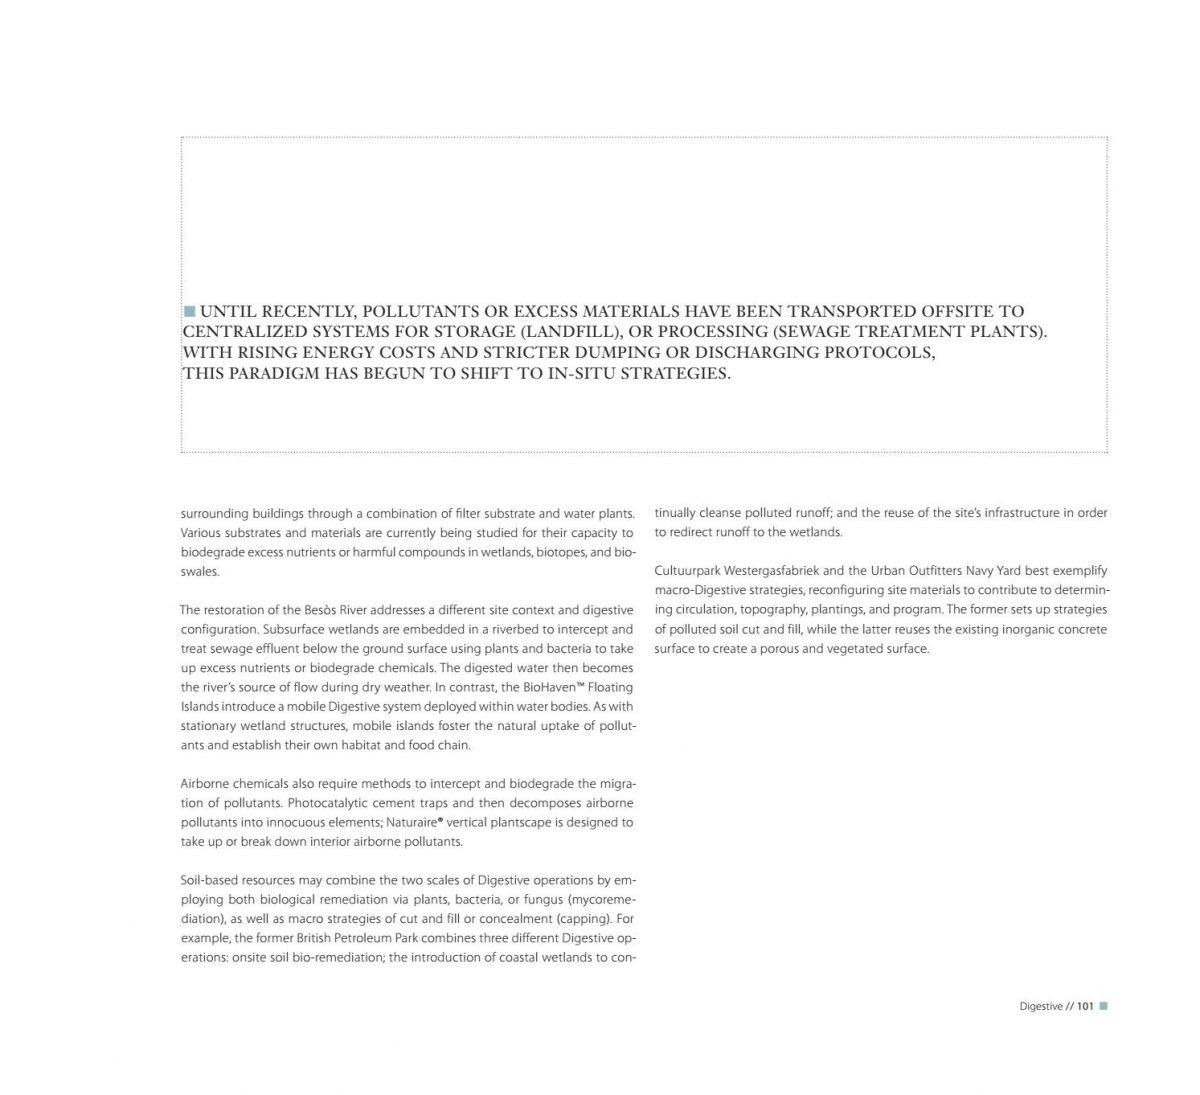 http://www.petkovstudio.com/bg/wp-content/uploads/2017/03/page_101-1200x1095.jpg